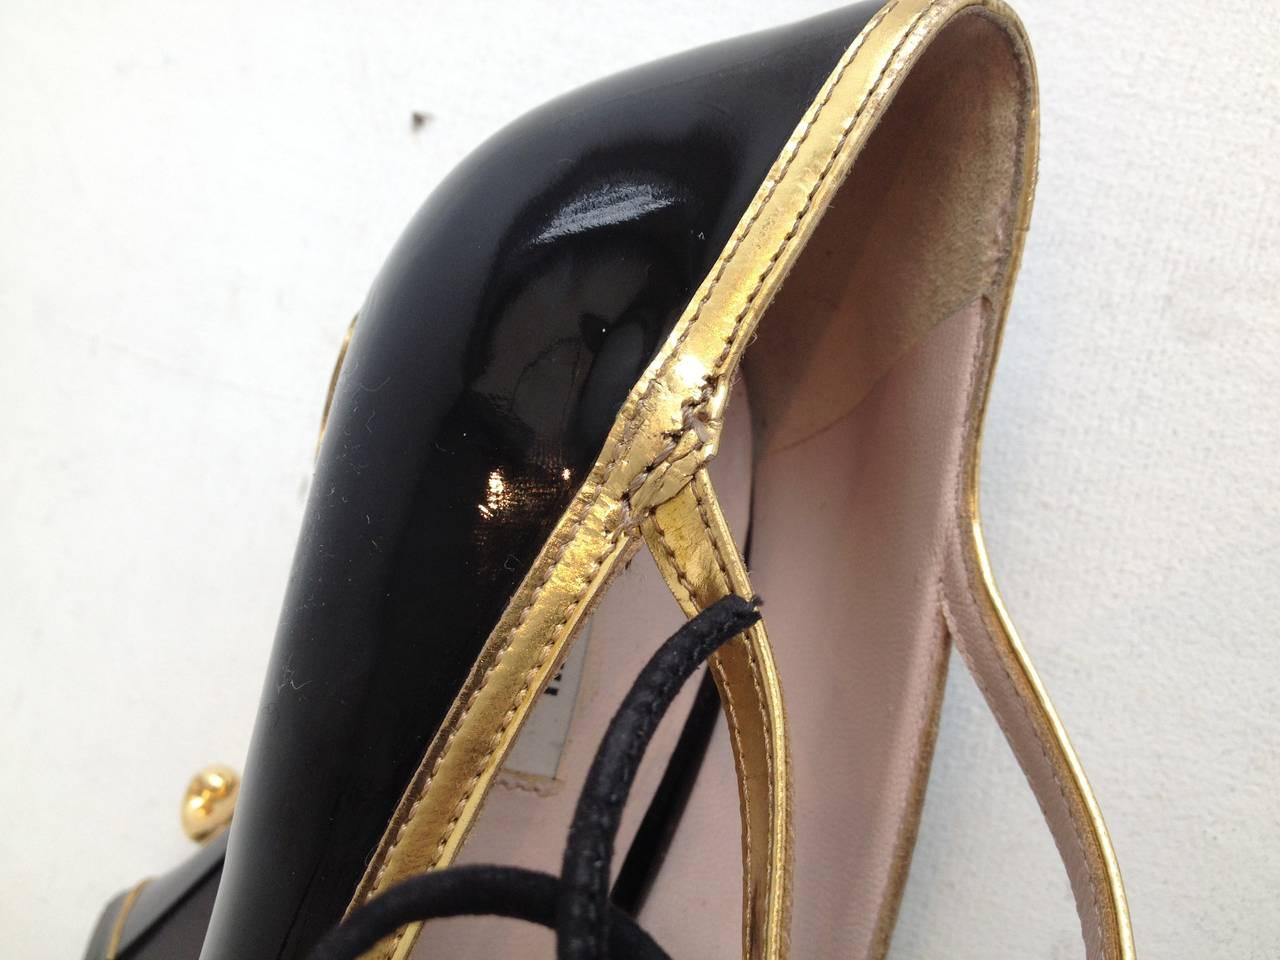 Miu Miu Black Patent Teacup Heels 6